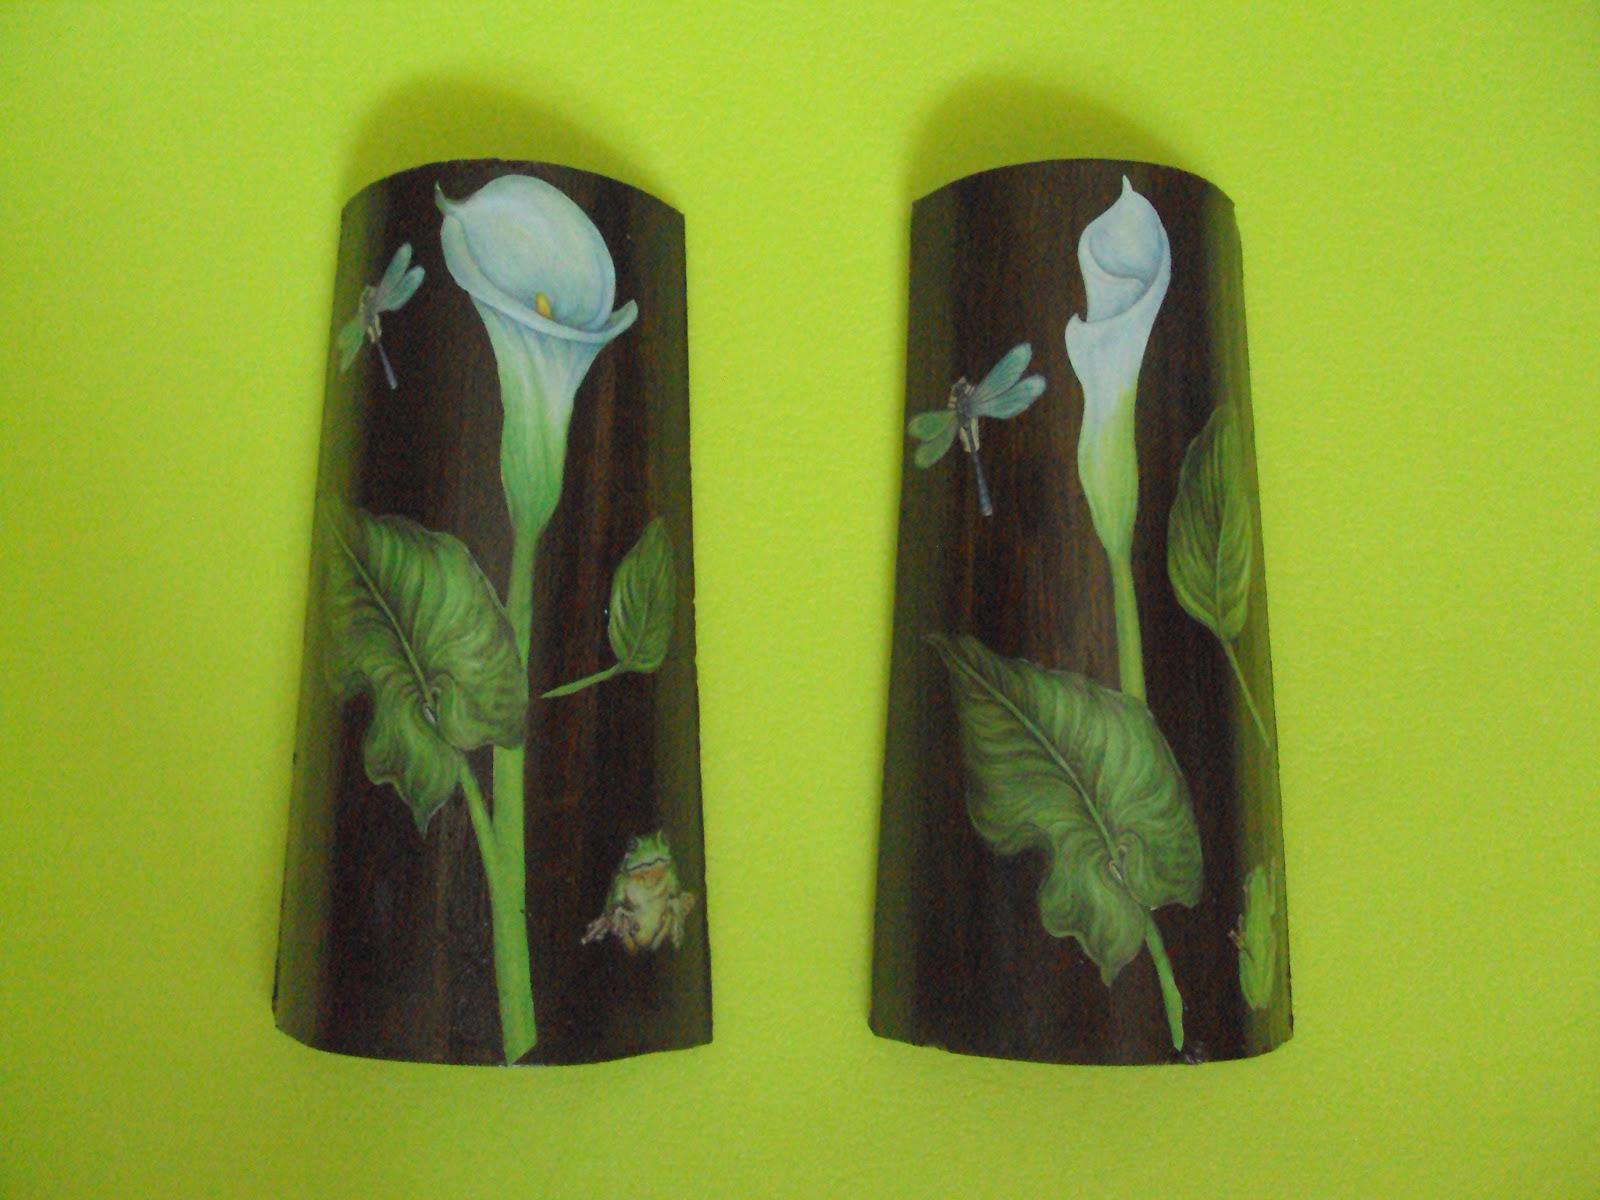 Manualidades mariavril decoupage - Tejas pequenas decoradas ...